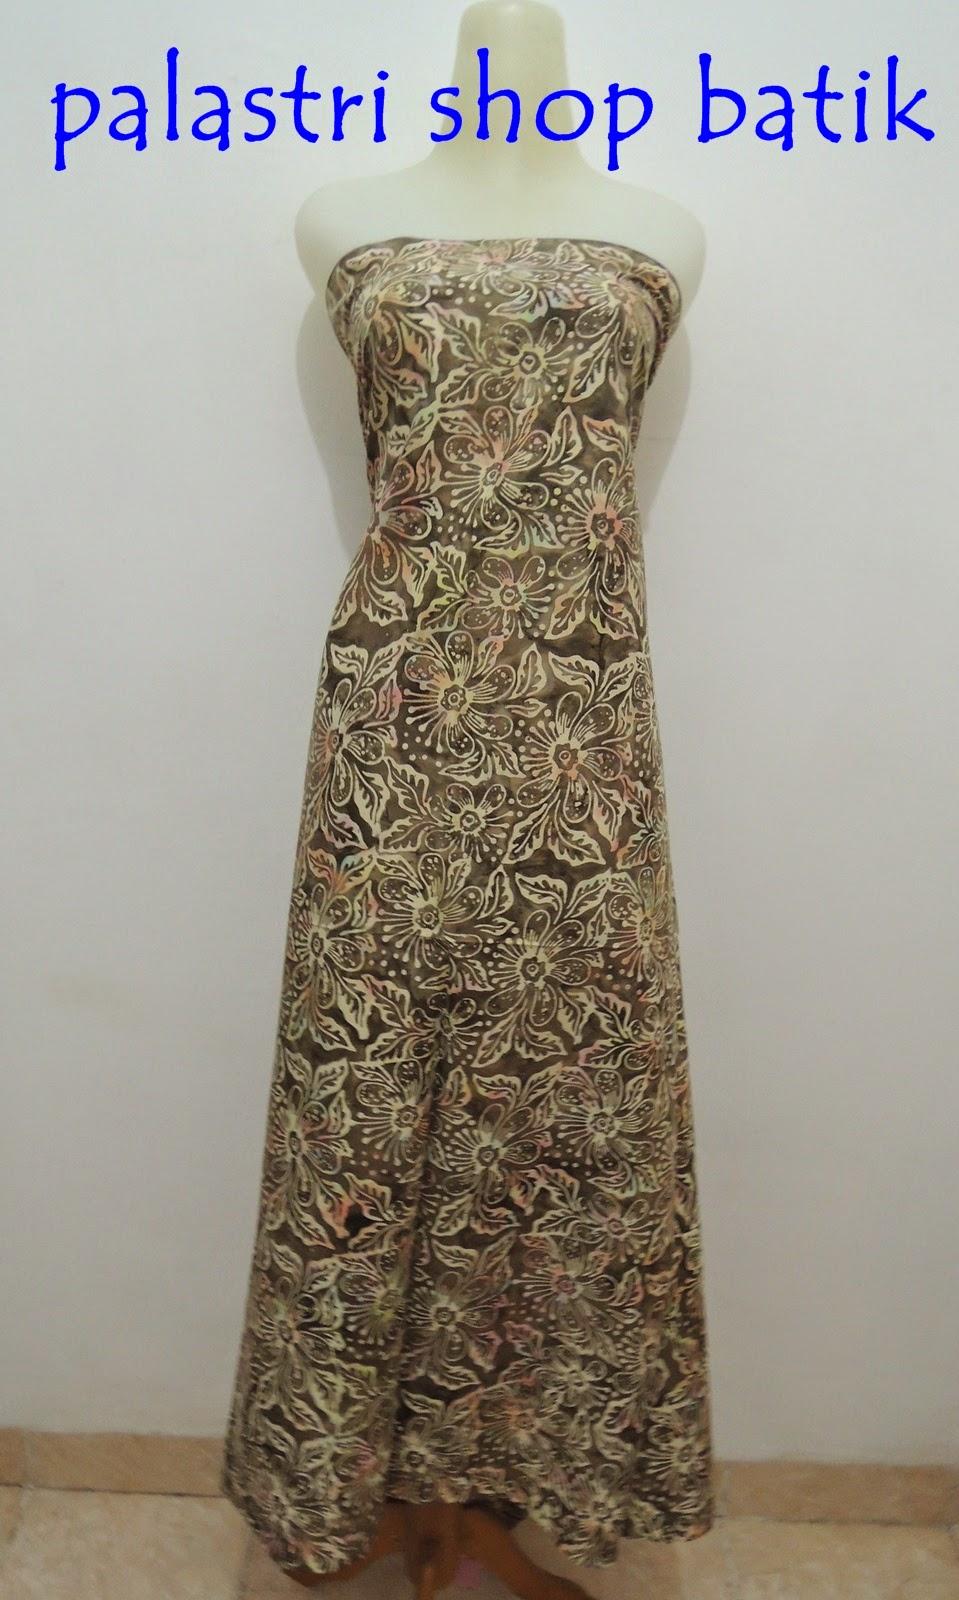 Palastri Shop  Gabriella Shop kain batik cap bali motif bunga